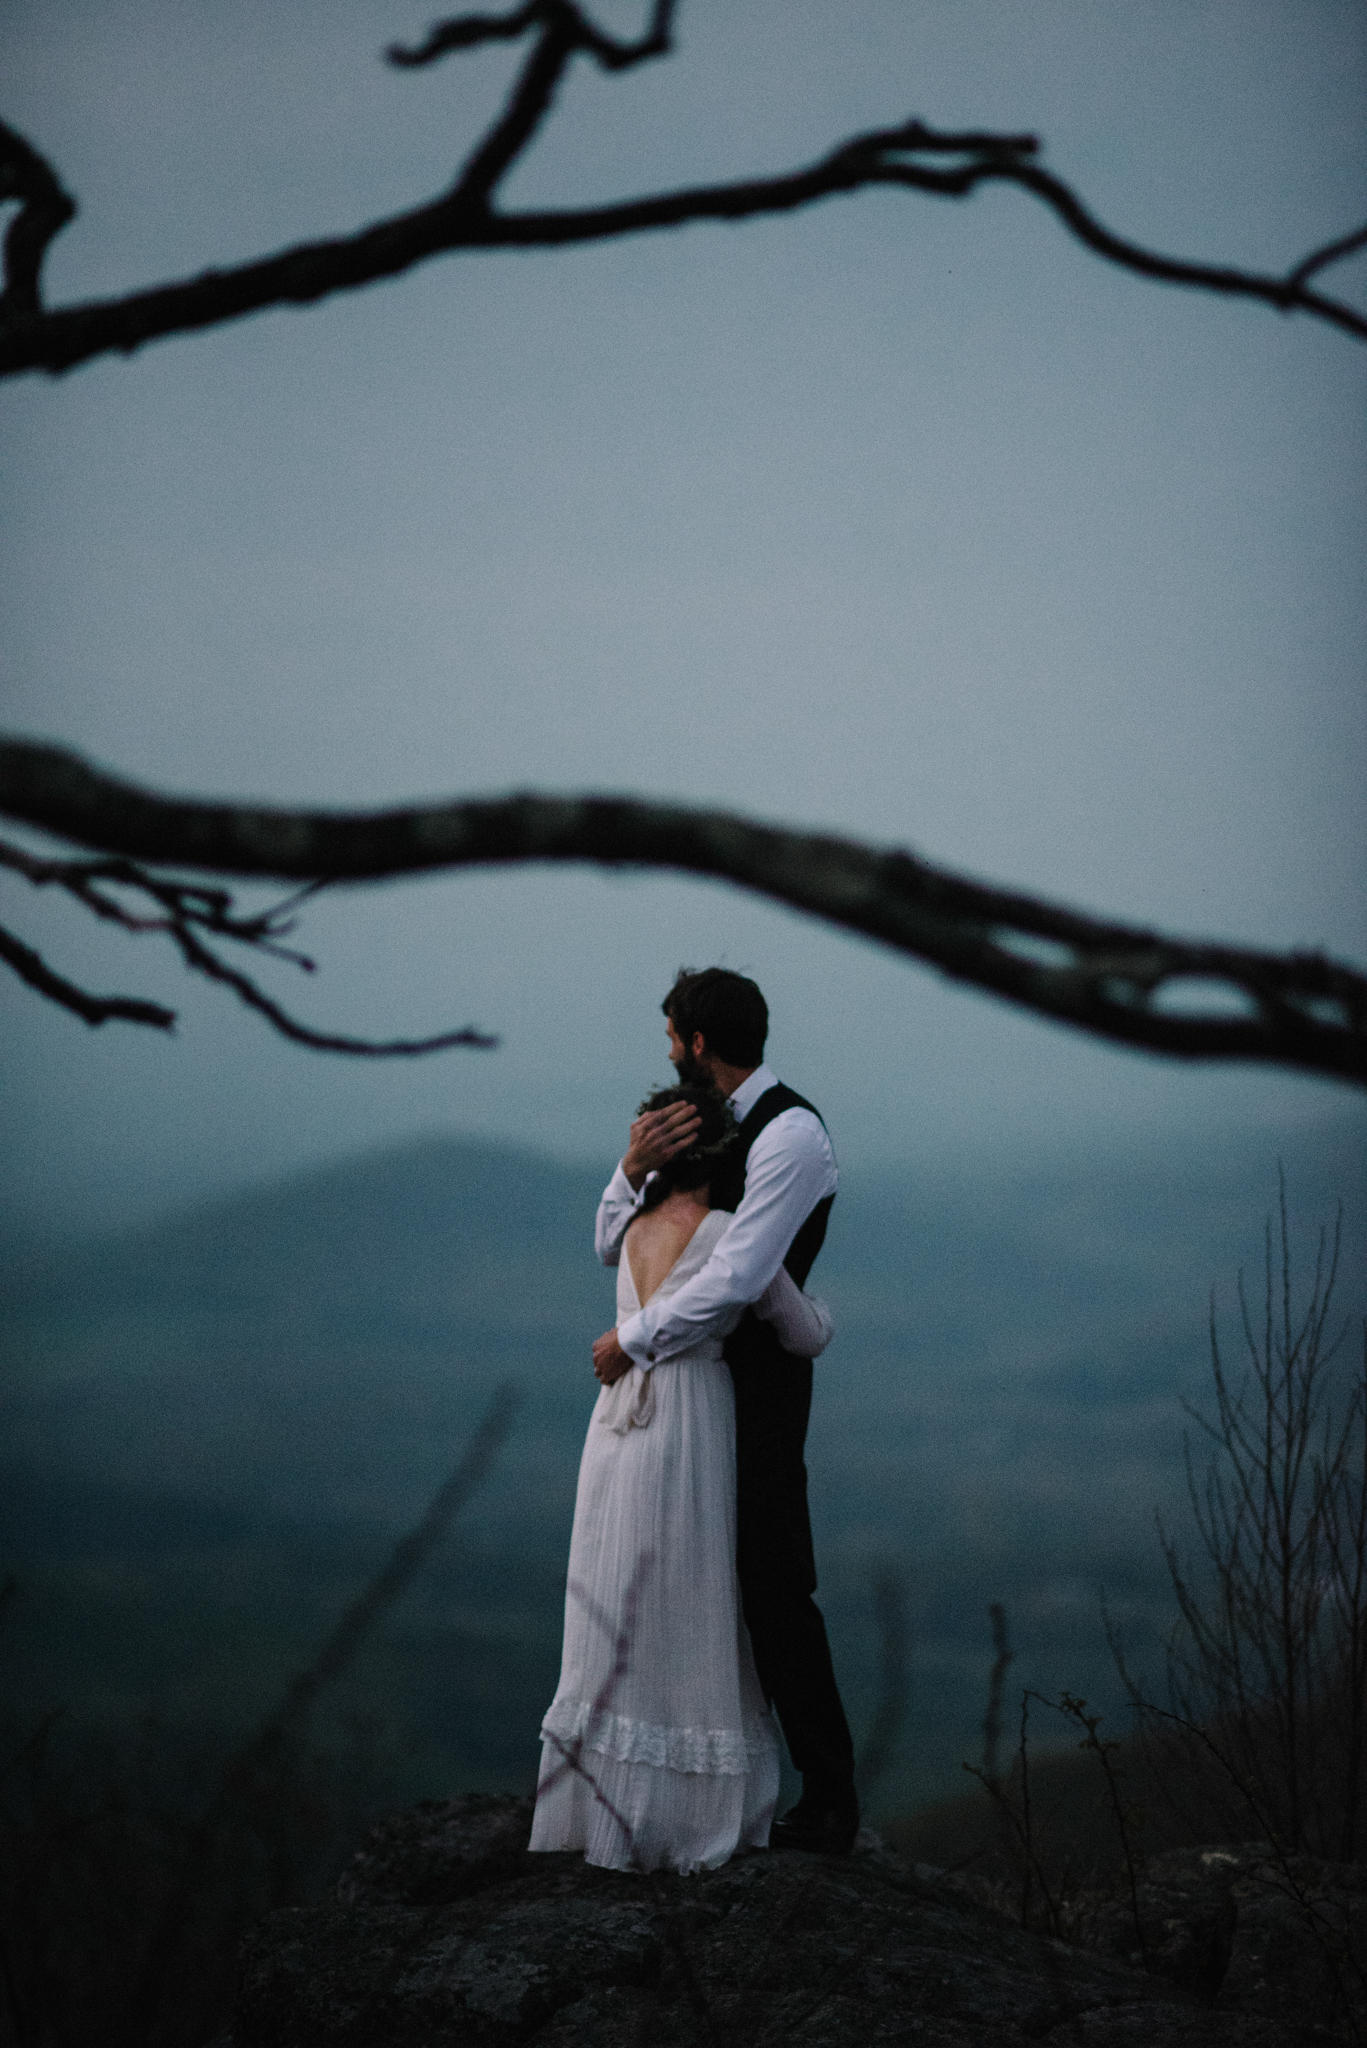 Lisa and Stuart - Post Wedding Couple Portraits - White Sails Creative - Blue Ridge Mountains - Sunrise Shenandoah National Park_56.JPG